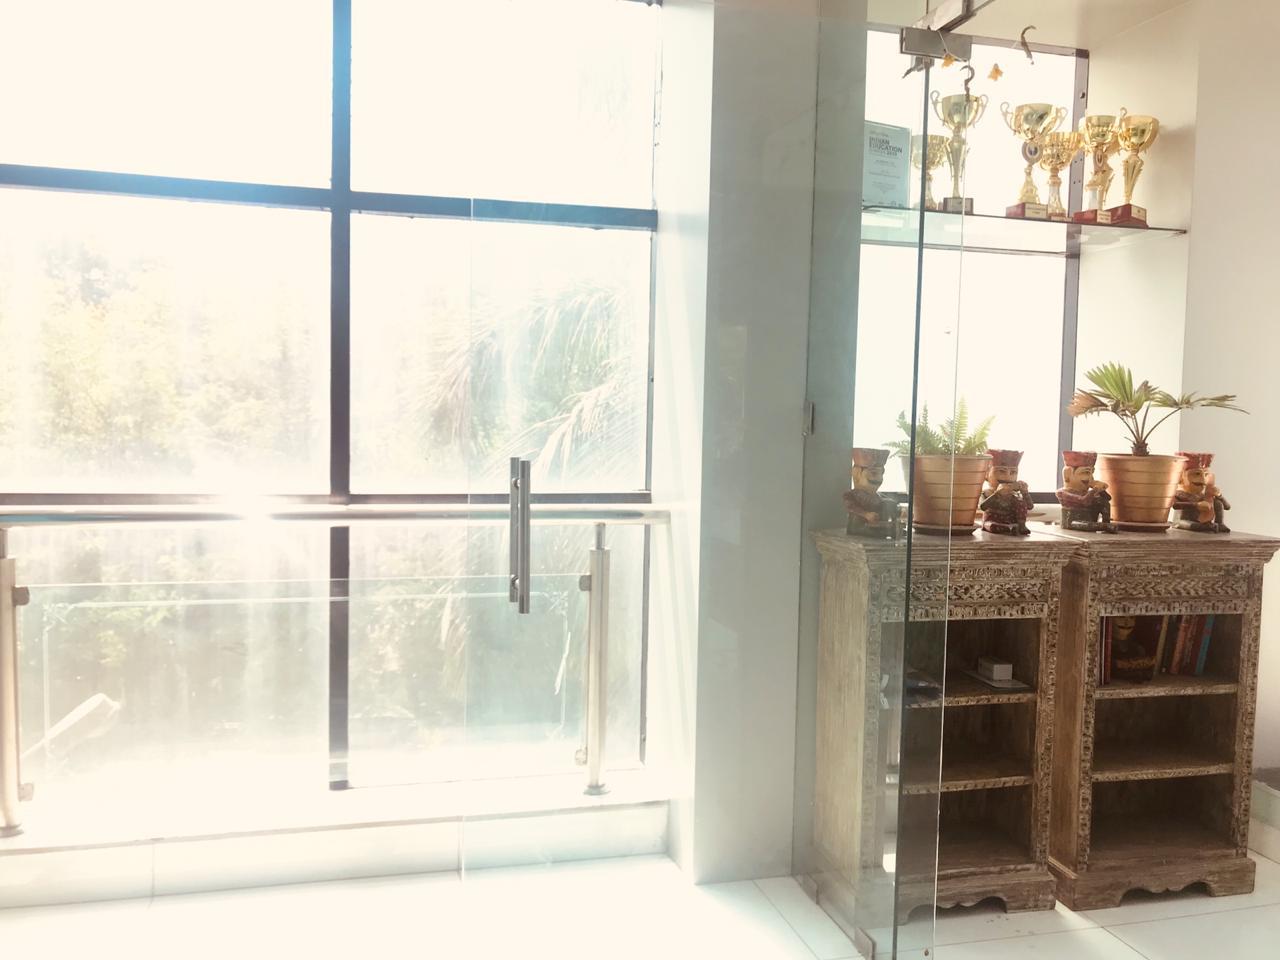 Studio By The Lake, Mumbai